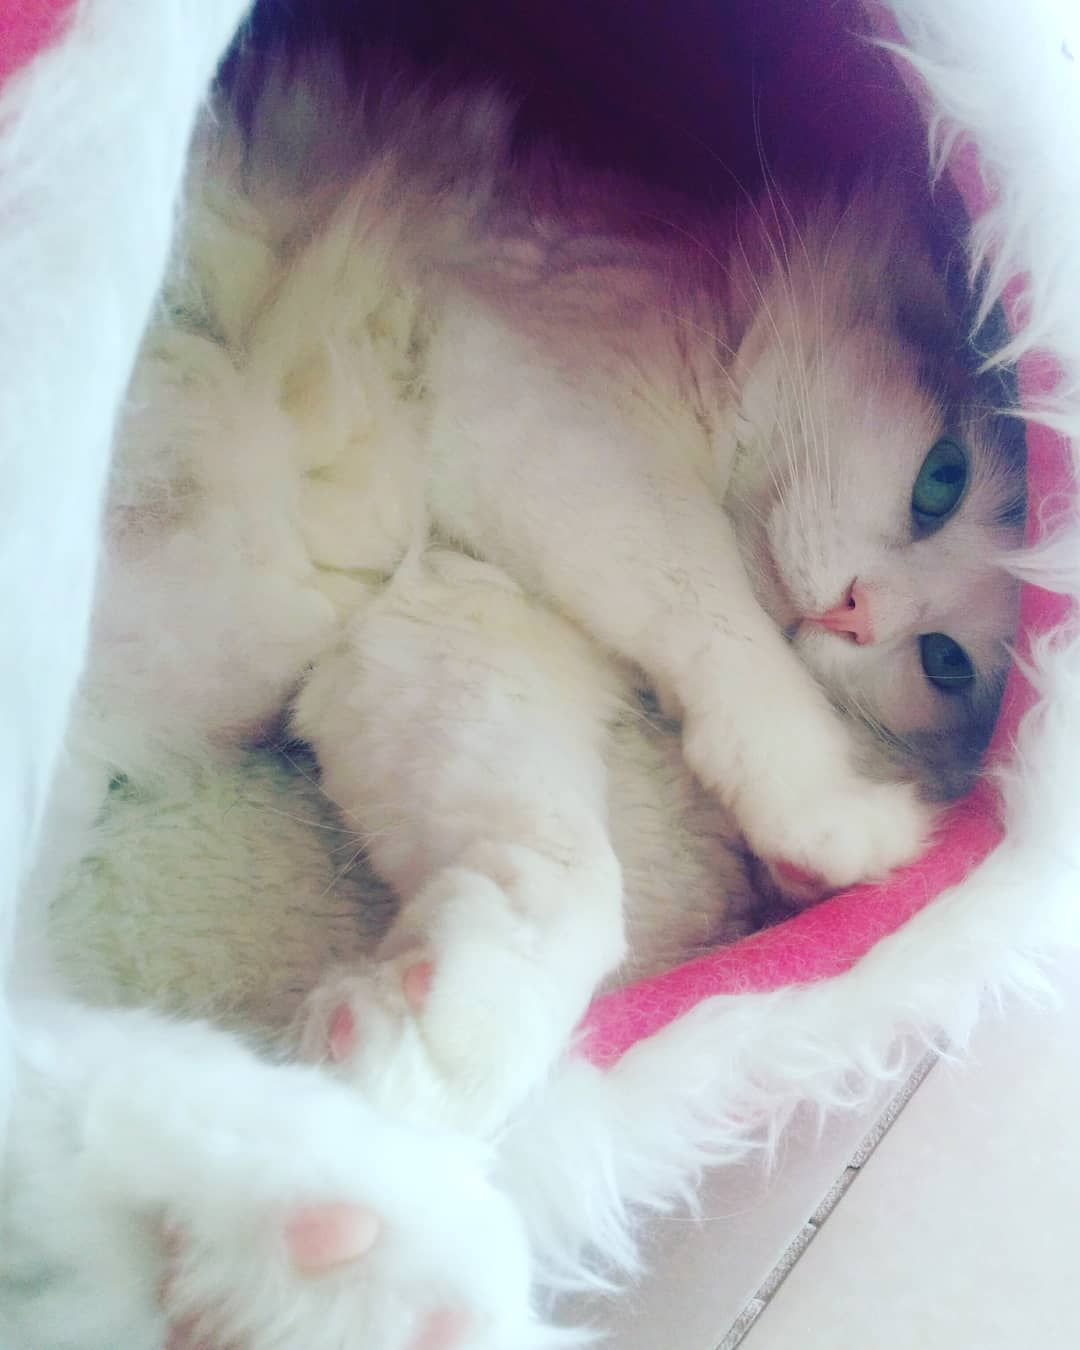 #neko #cat #katze #catfromshelter #猫 #ねこ #保険所出身